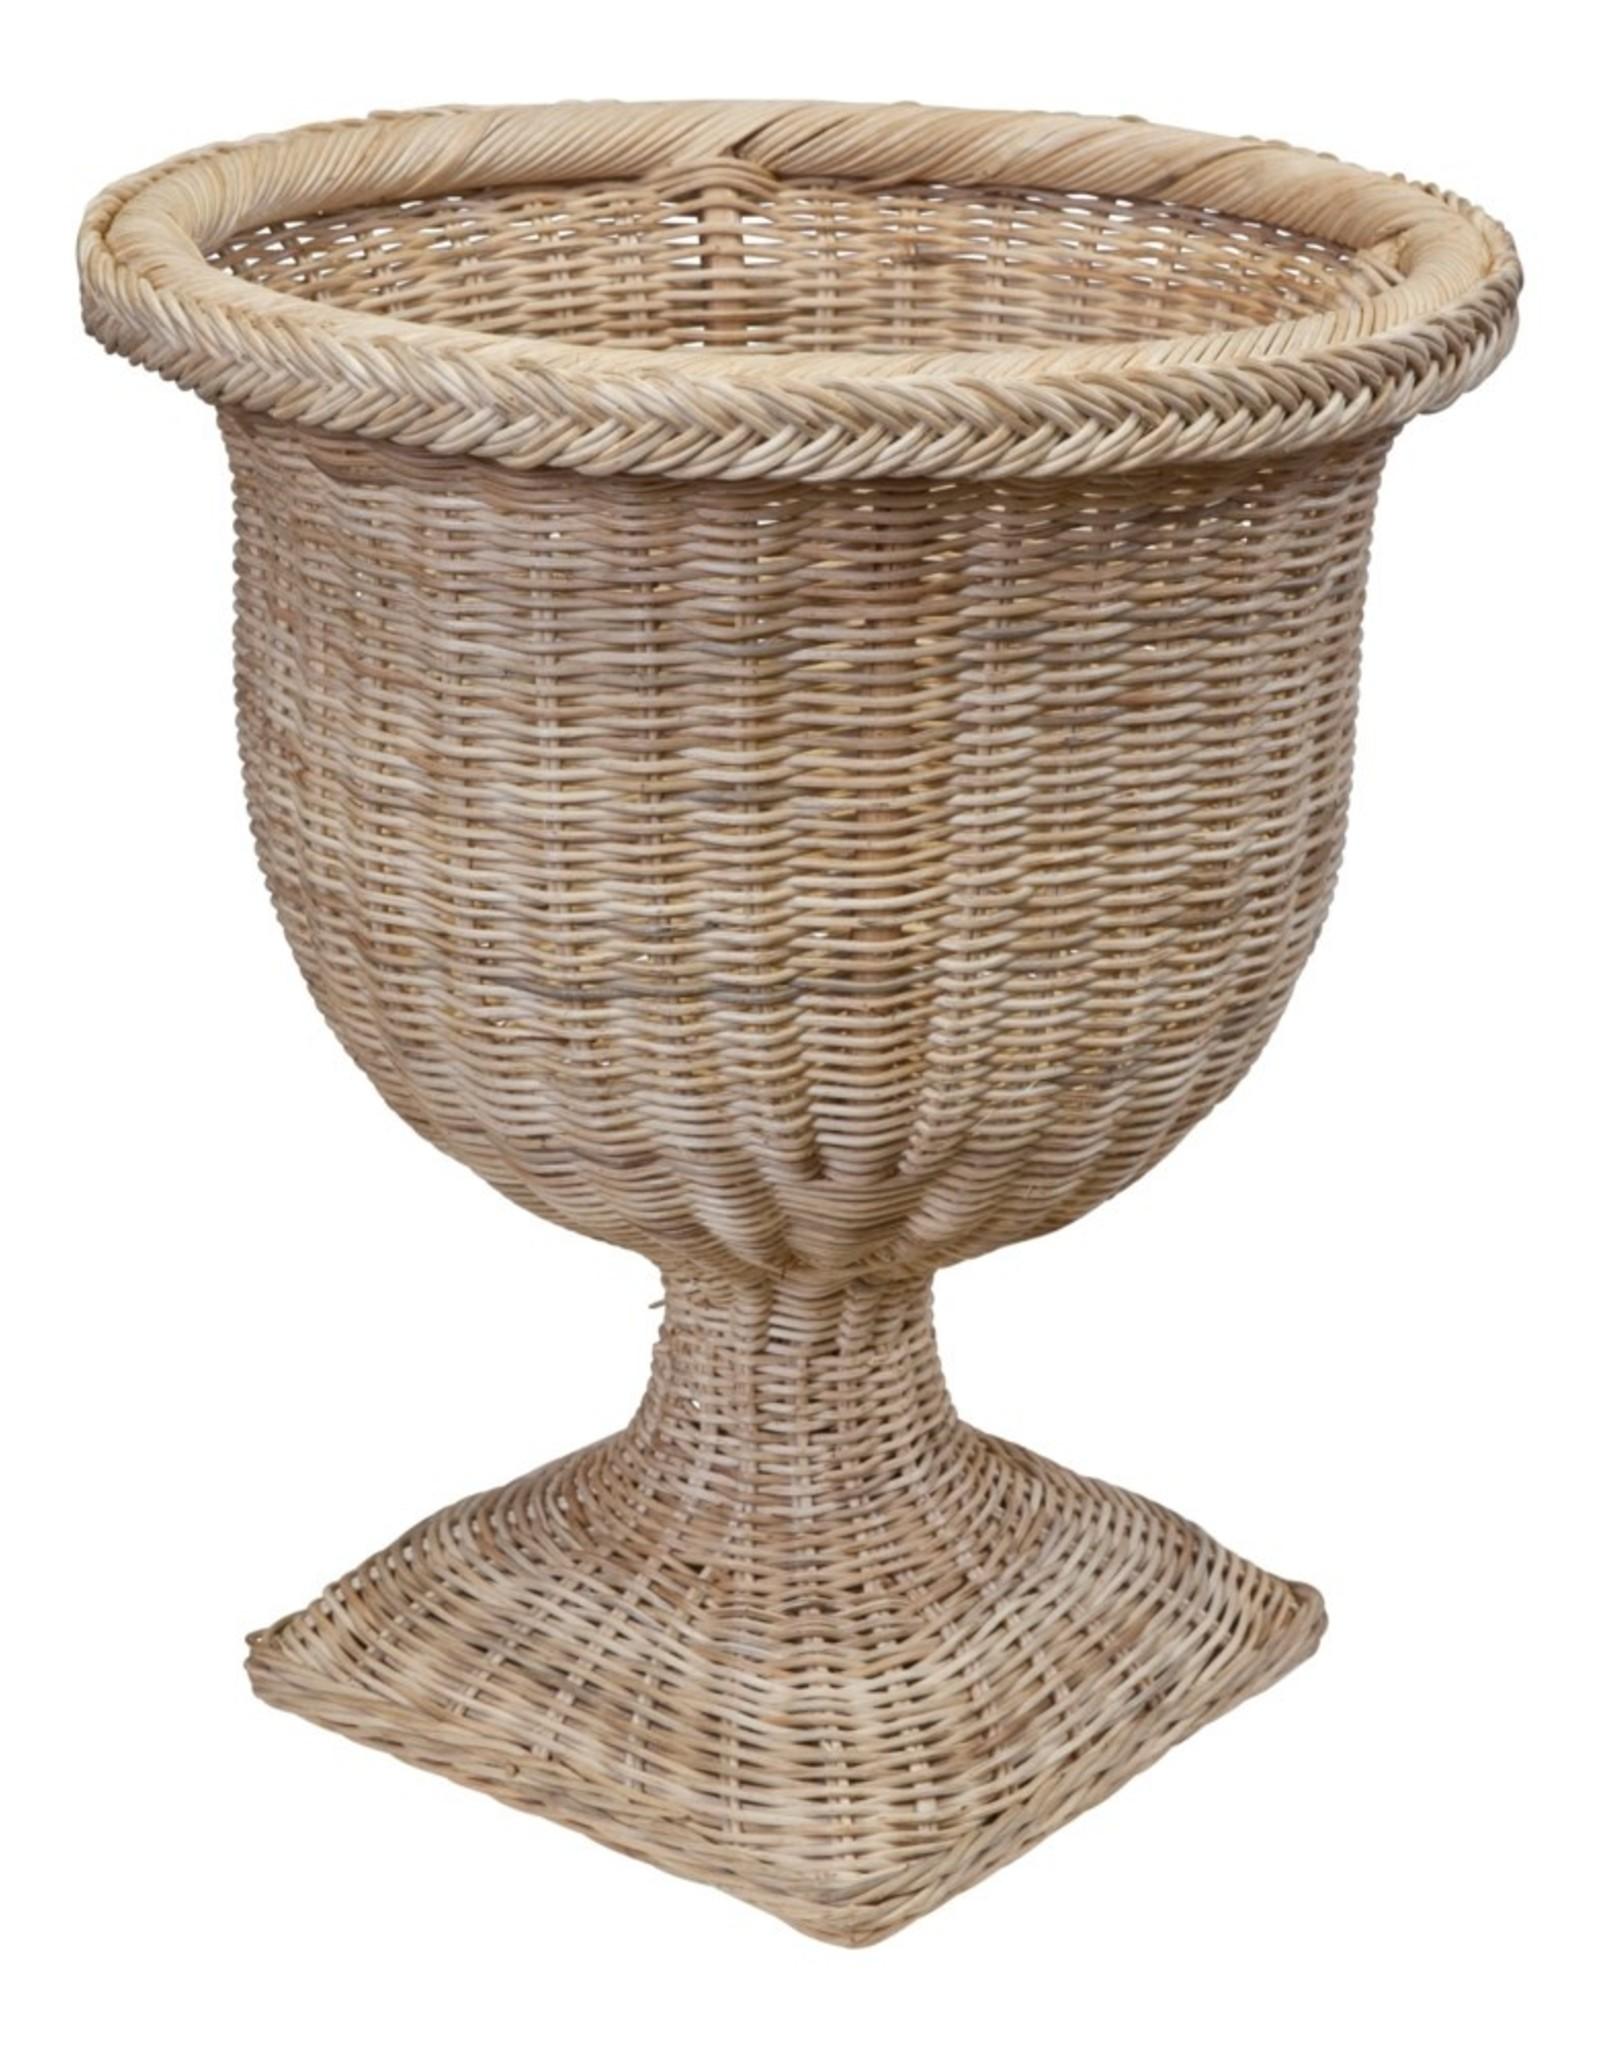 Mainly Baskets Braided Urn